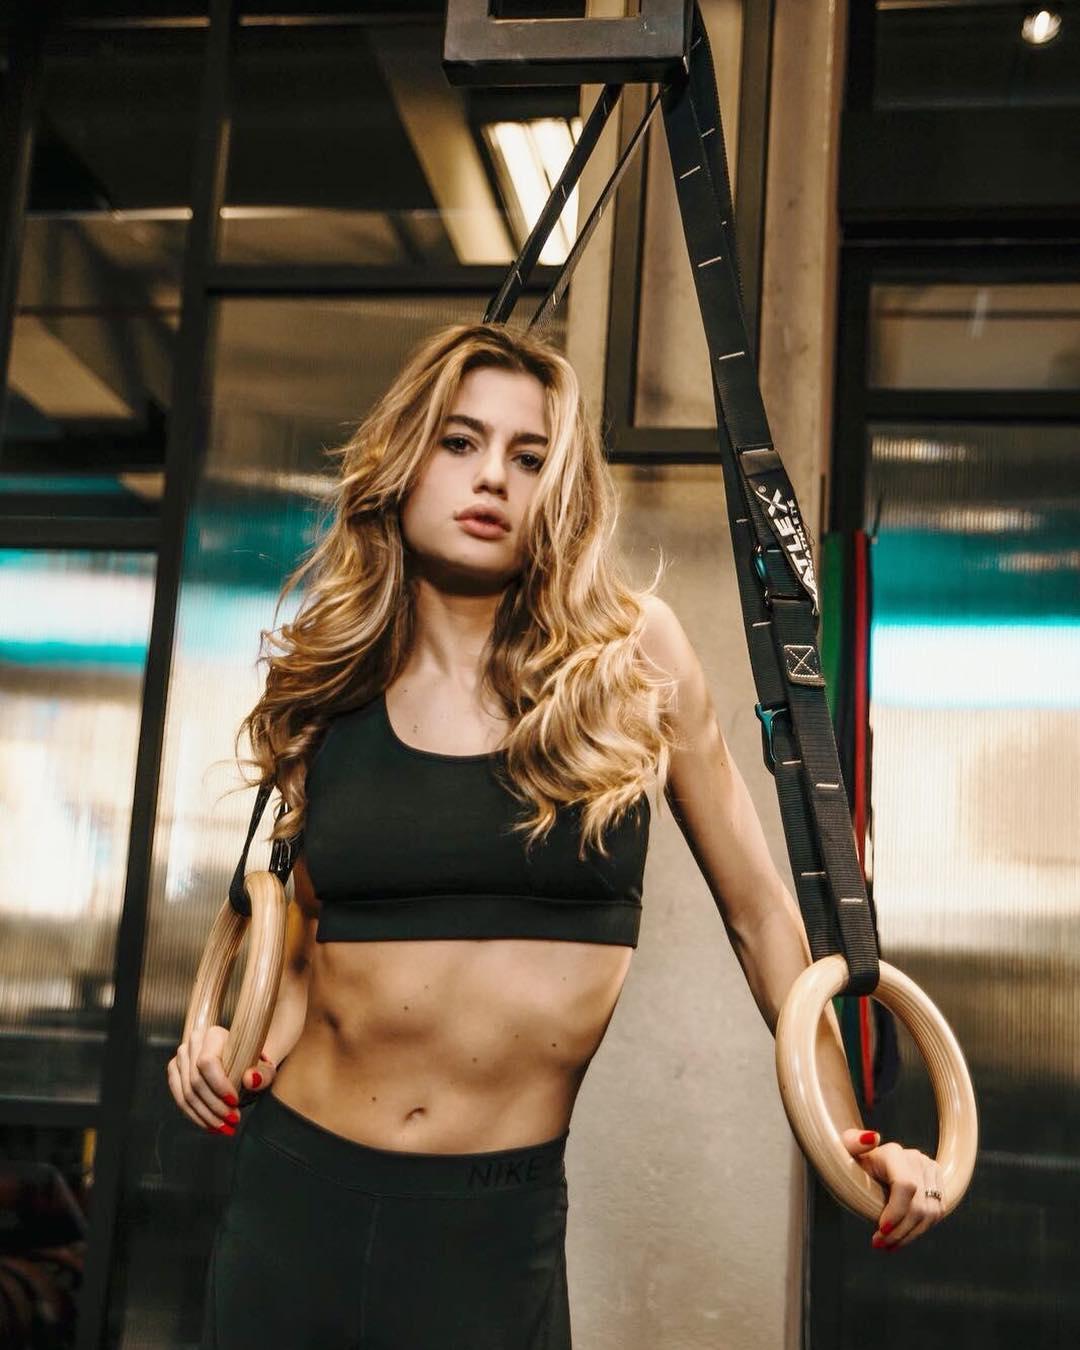 Hot Cristina Marino nudes (48 photos), Sexy, Hot, Feet, lingerie 2019